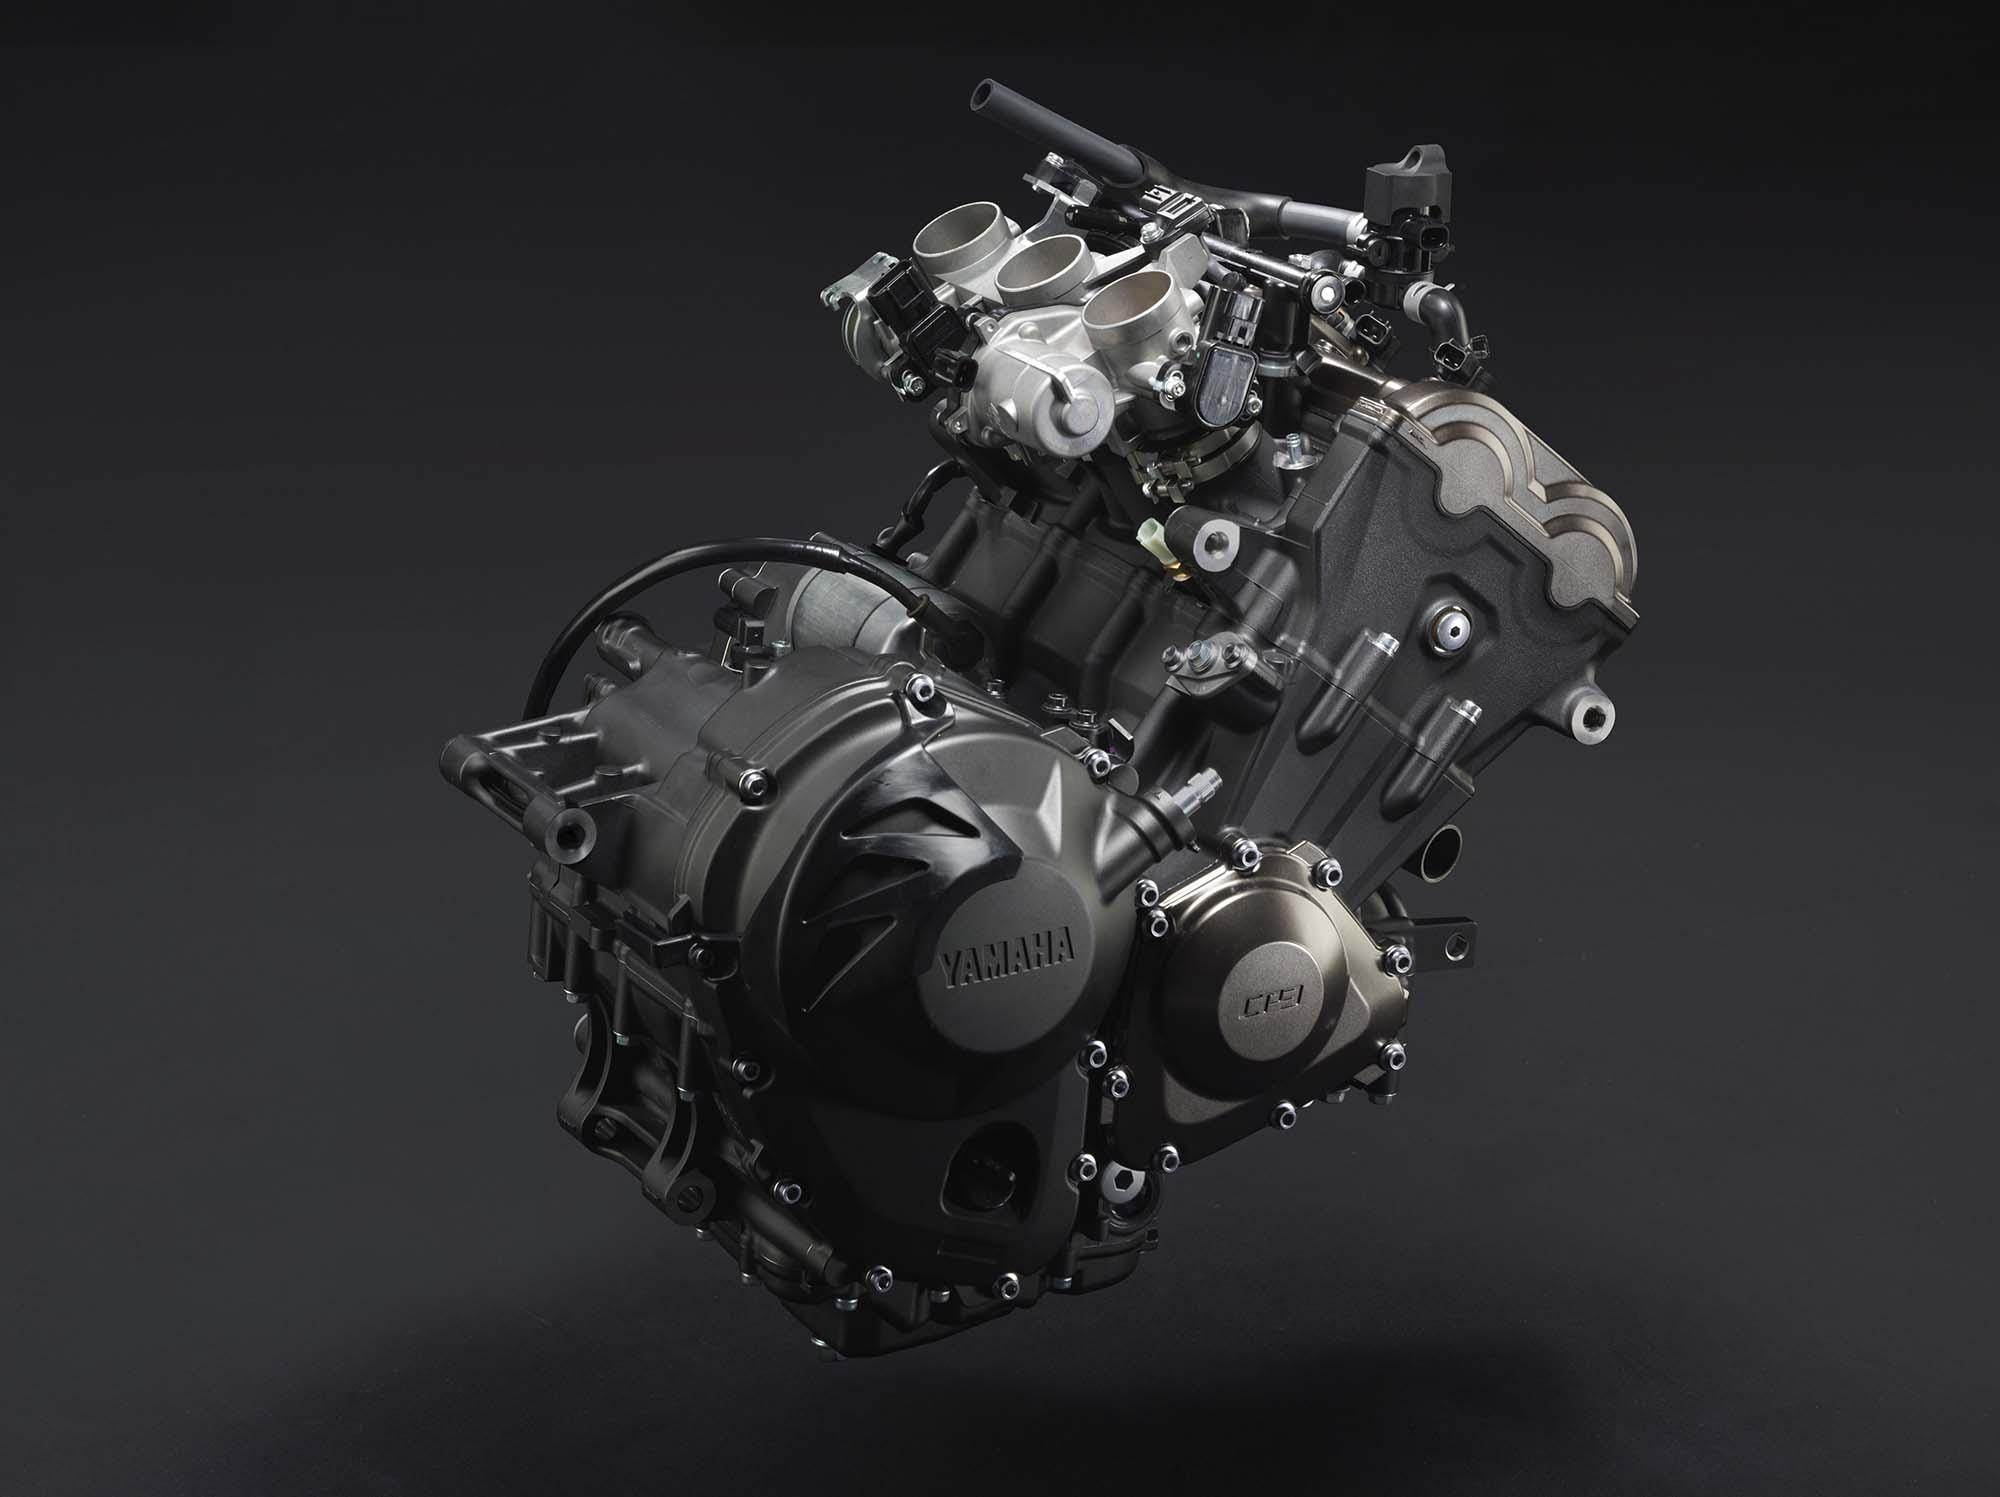 2014 Yamaha Fz 09 Three Cylinders Of Naked Asphalt